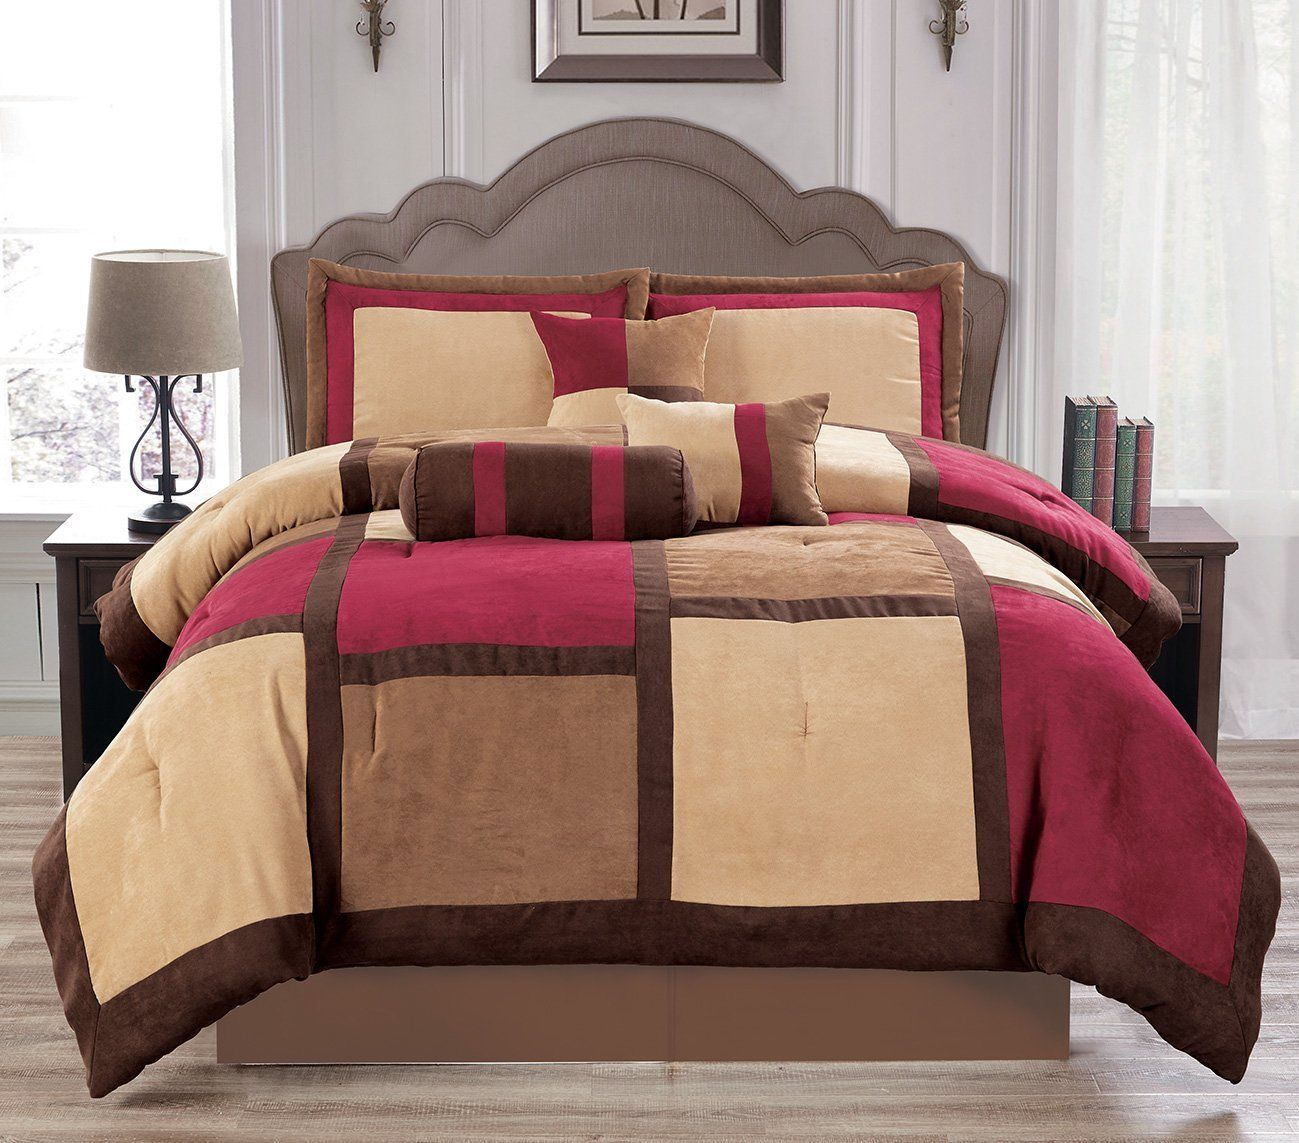 luxurious 11piece micro suede winter soft comforter set